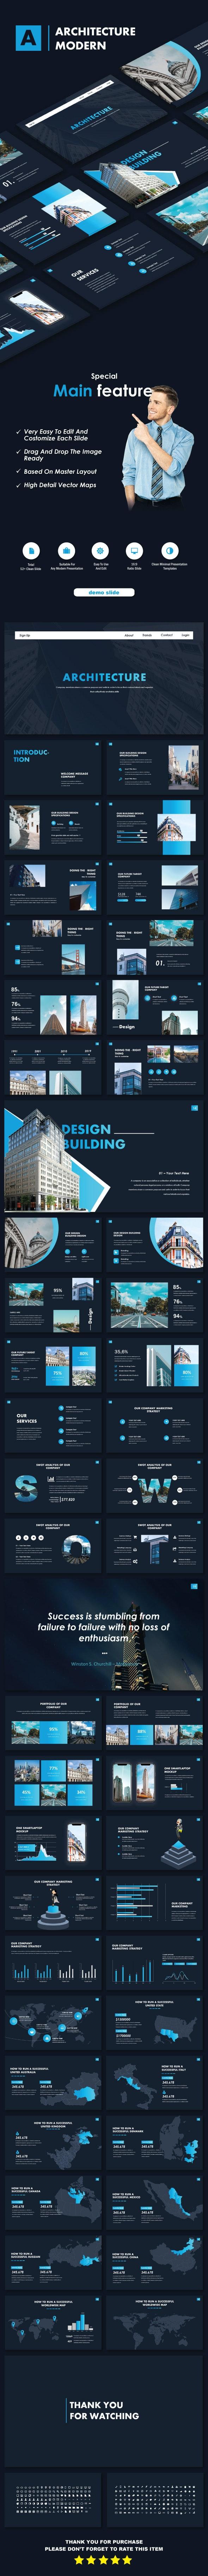 Architecture Modern Google Slide Templates - Google Slides Presentation Templates